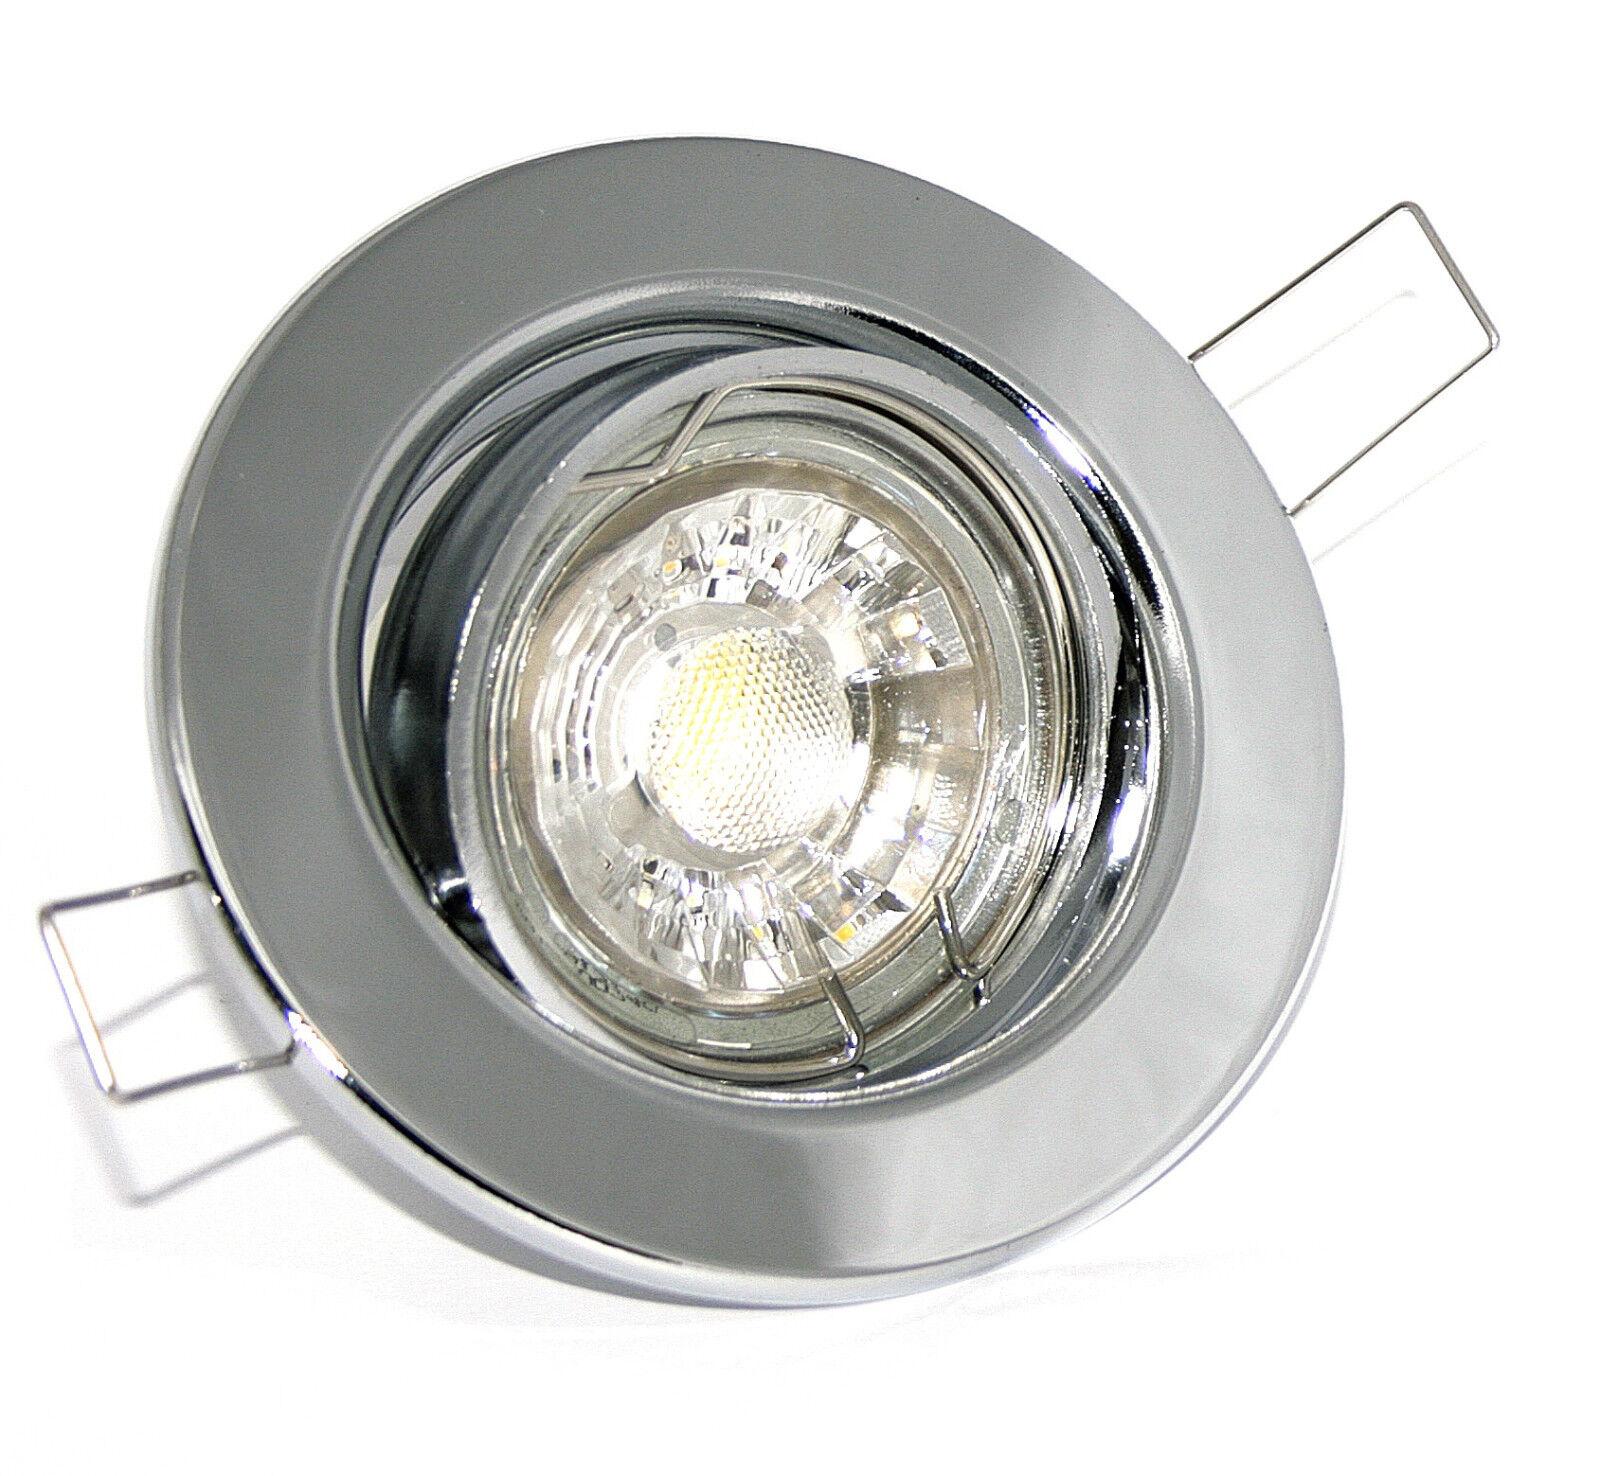 Runde Einbaustrahler K9222 Set Einbauspot GU10 LED 3W COB Einbaurahmen Strahler